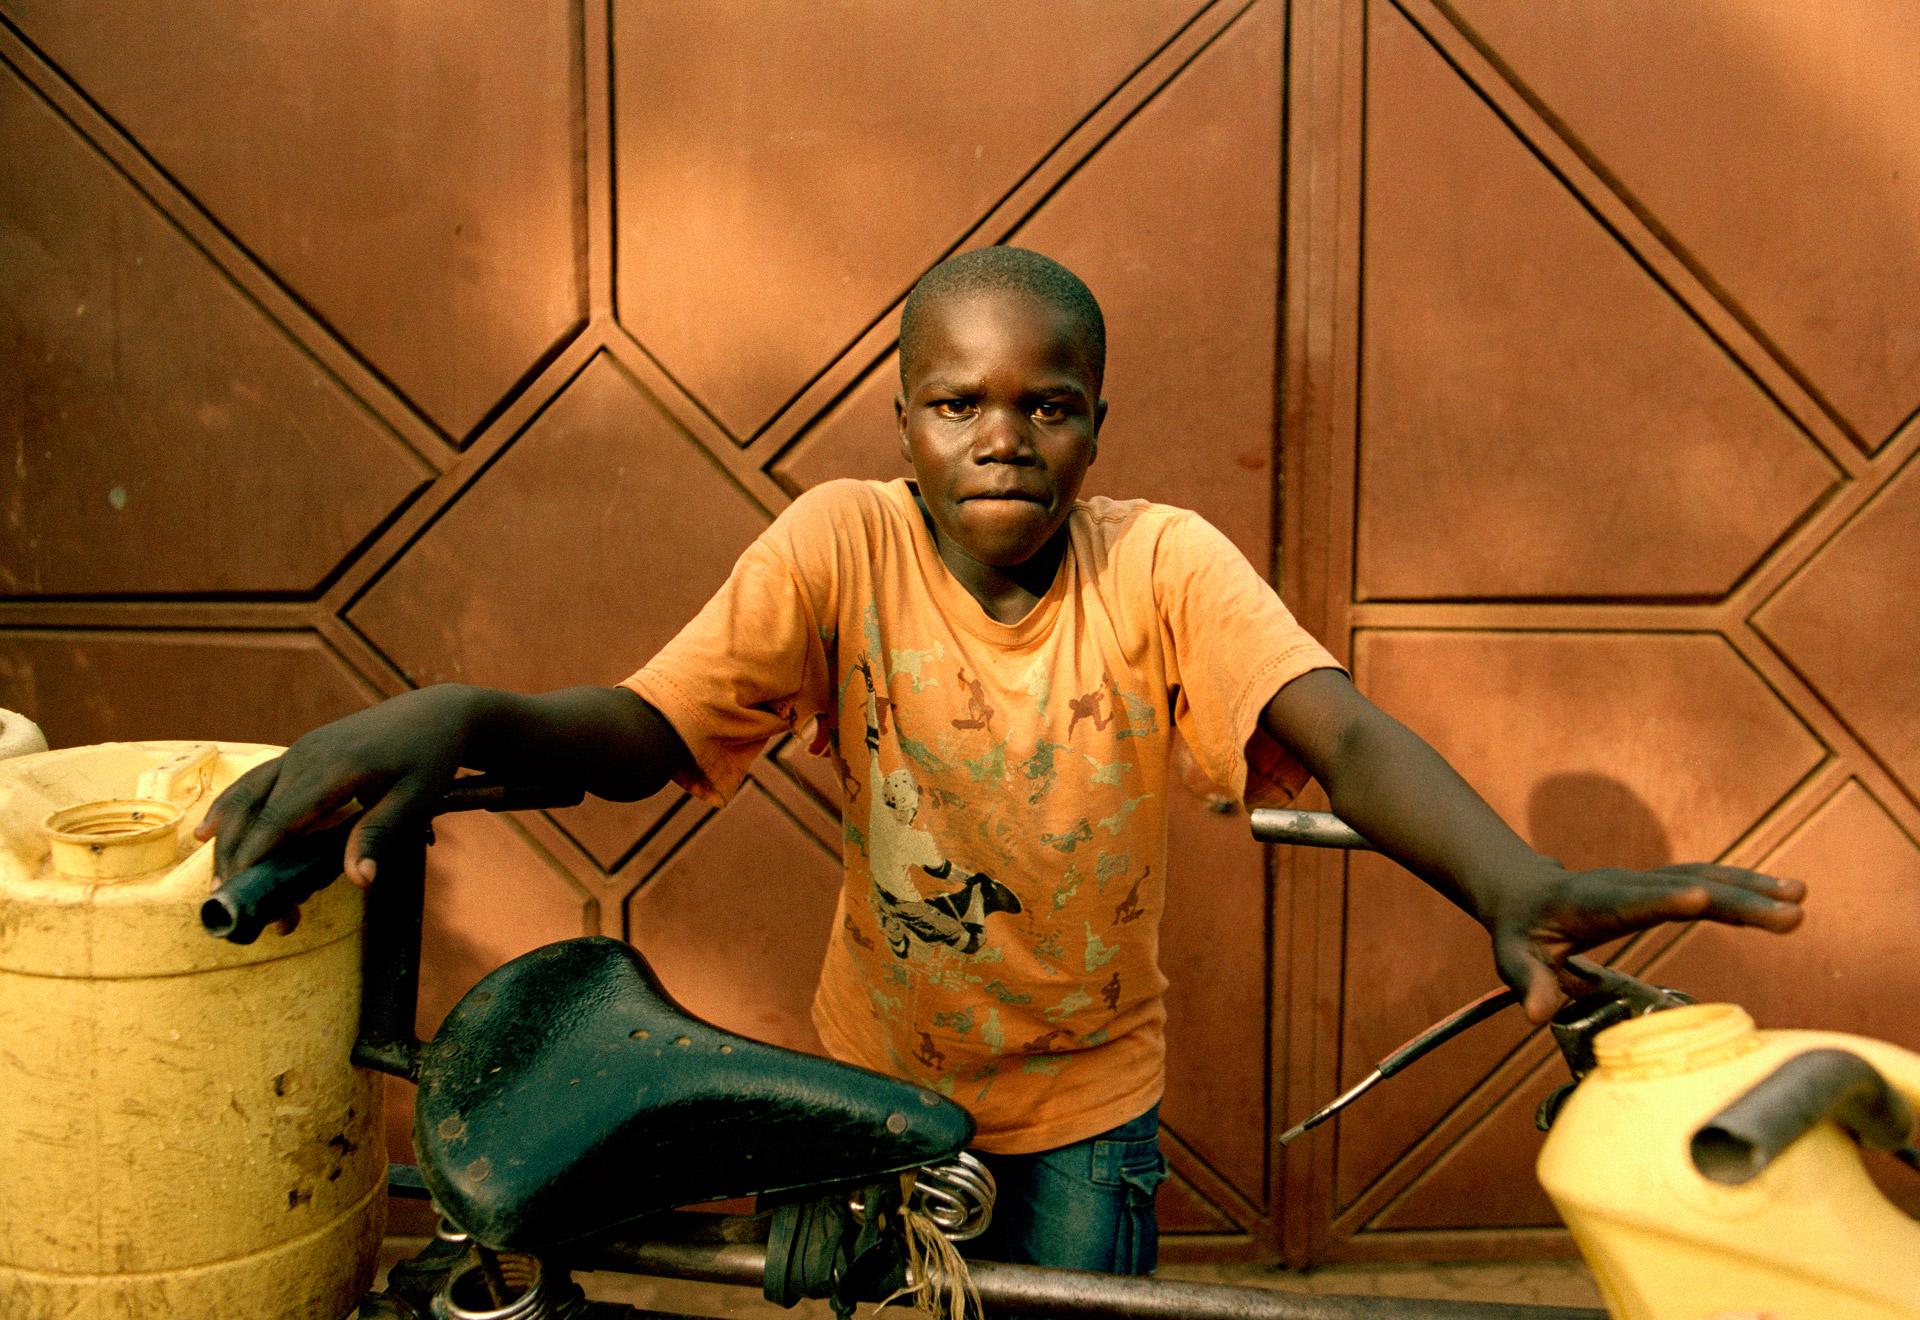 A boy fetching water in Kenya